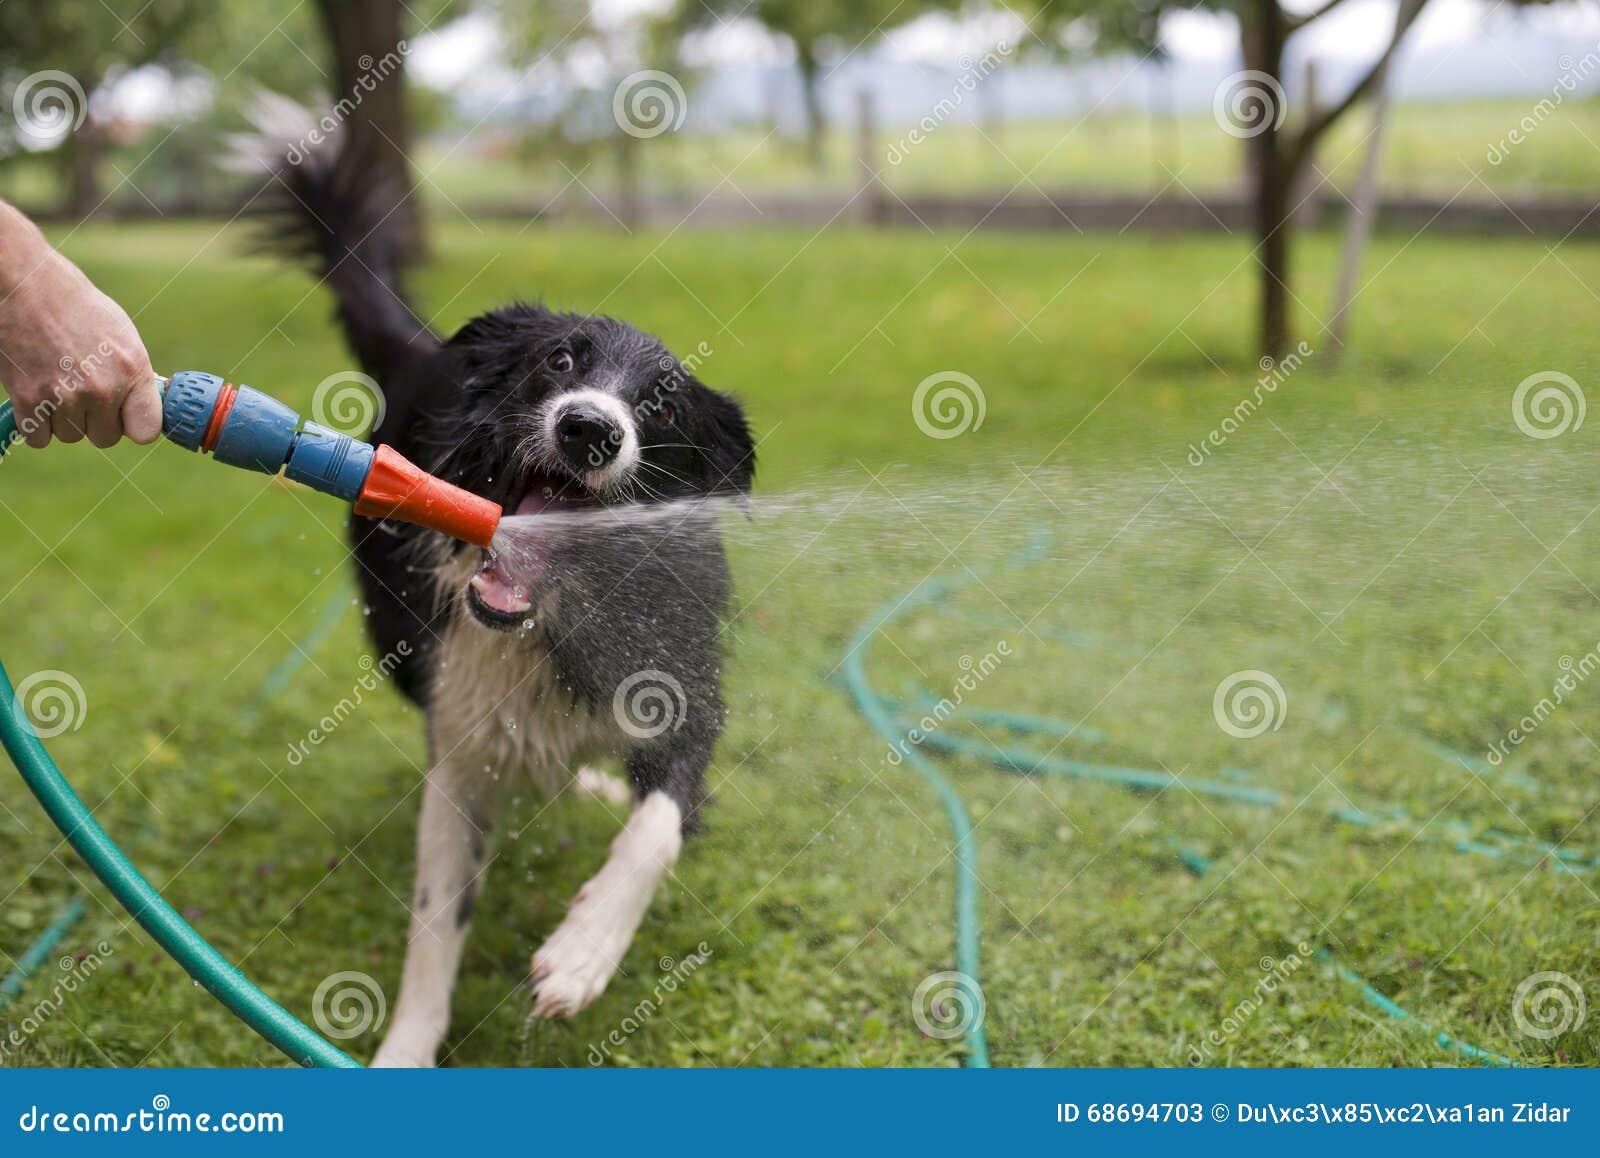 Download Dog playing stock image. Image of pipe, shower, animal - 68694703